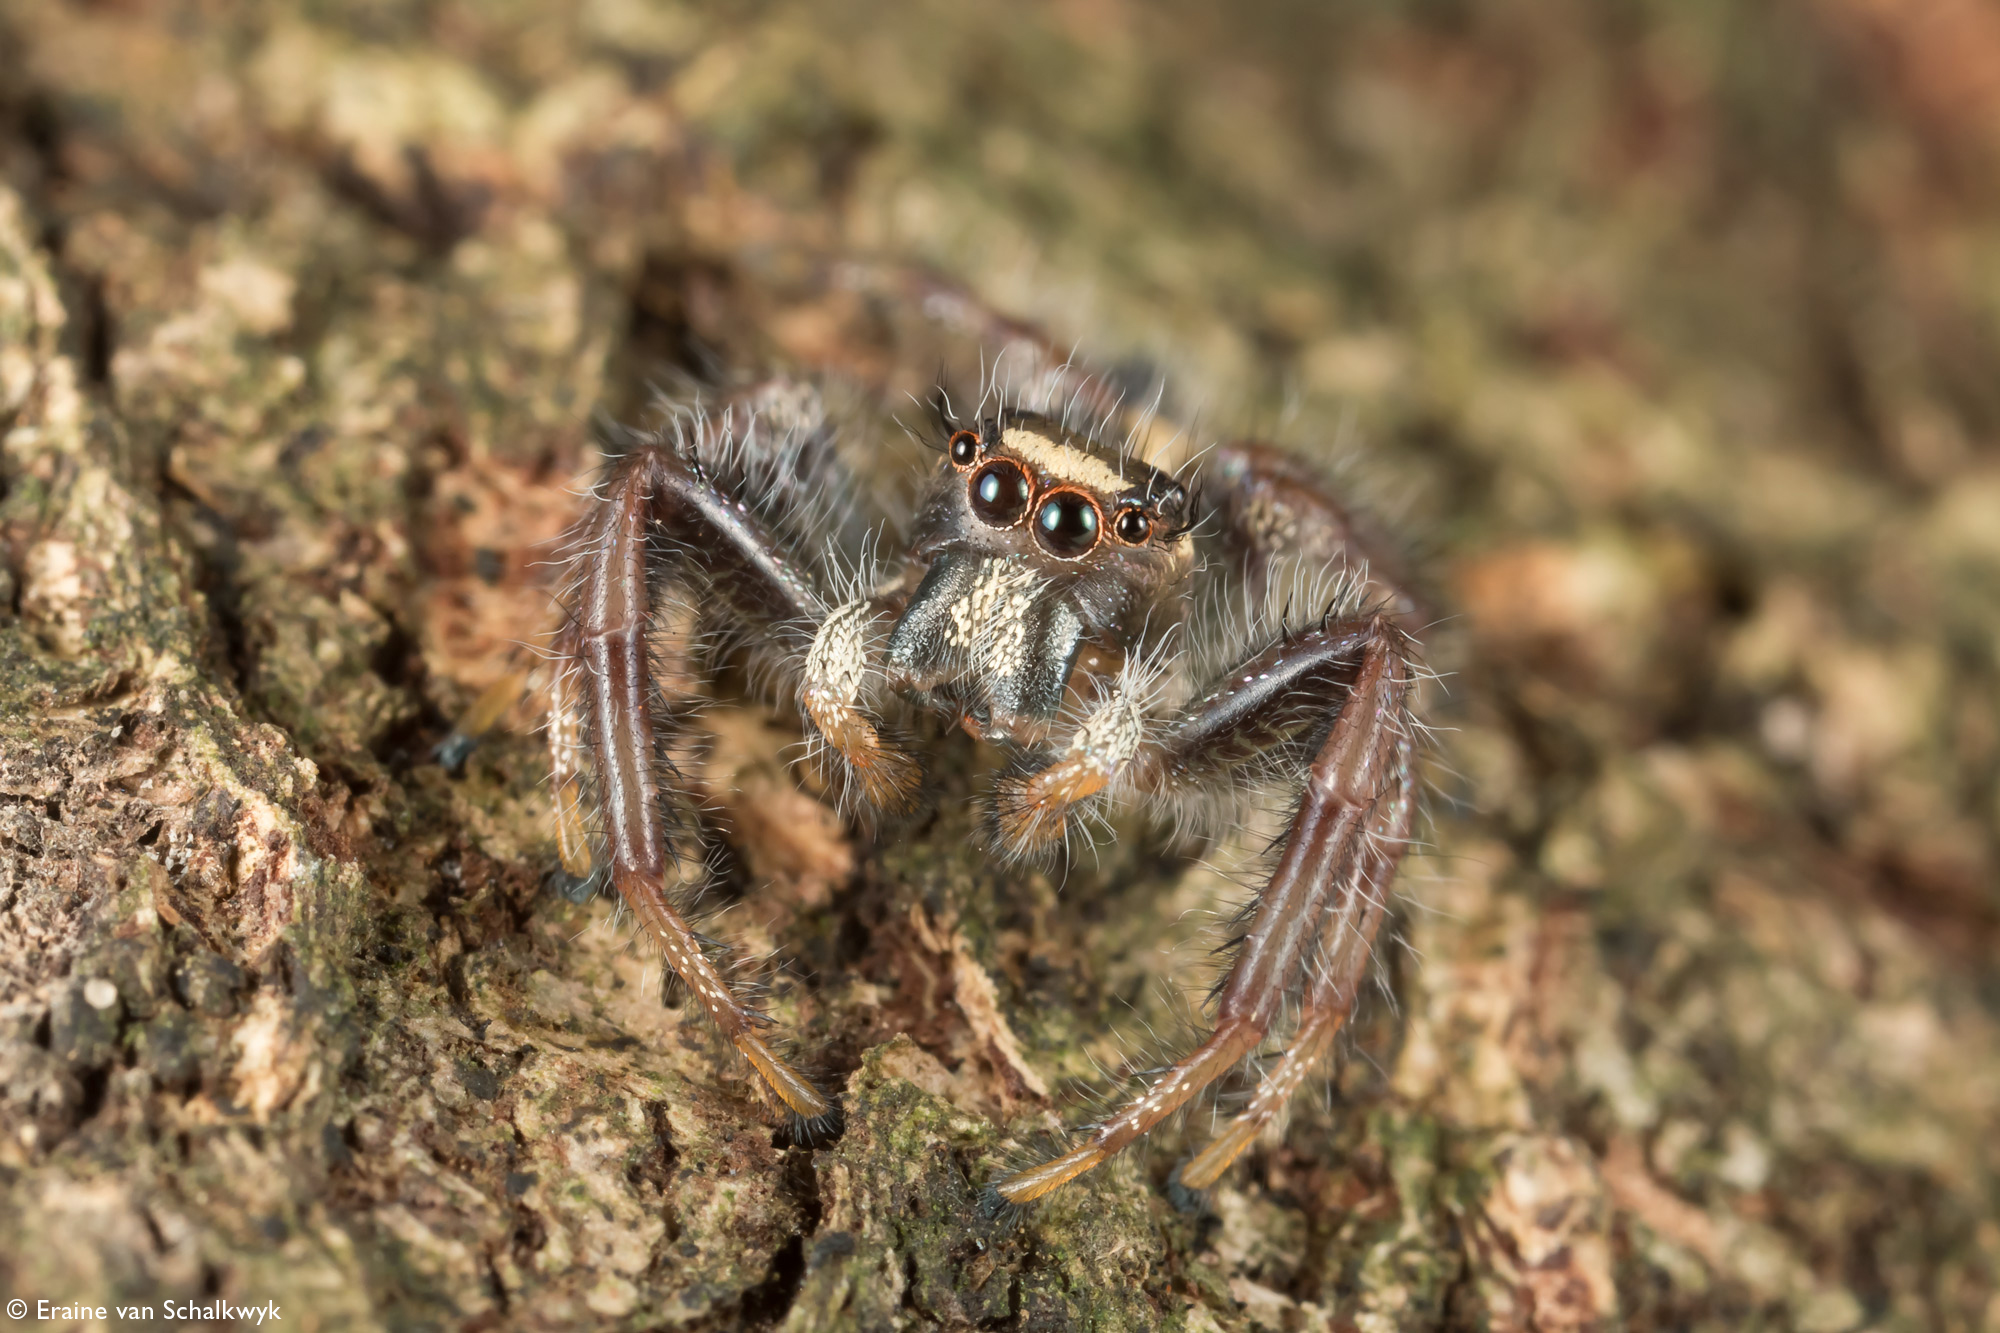 Jumping spider on tree trunk, arachnid, macro photography